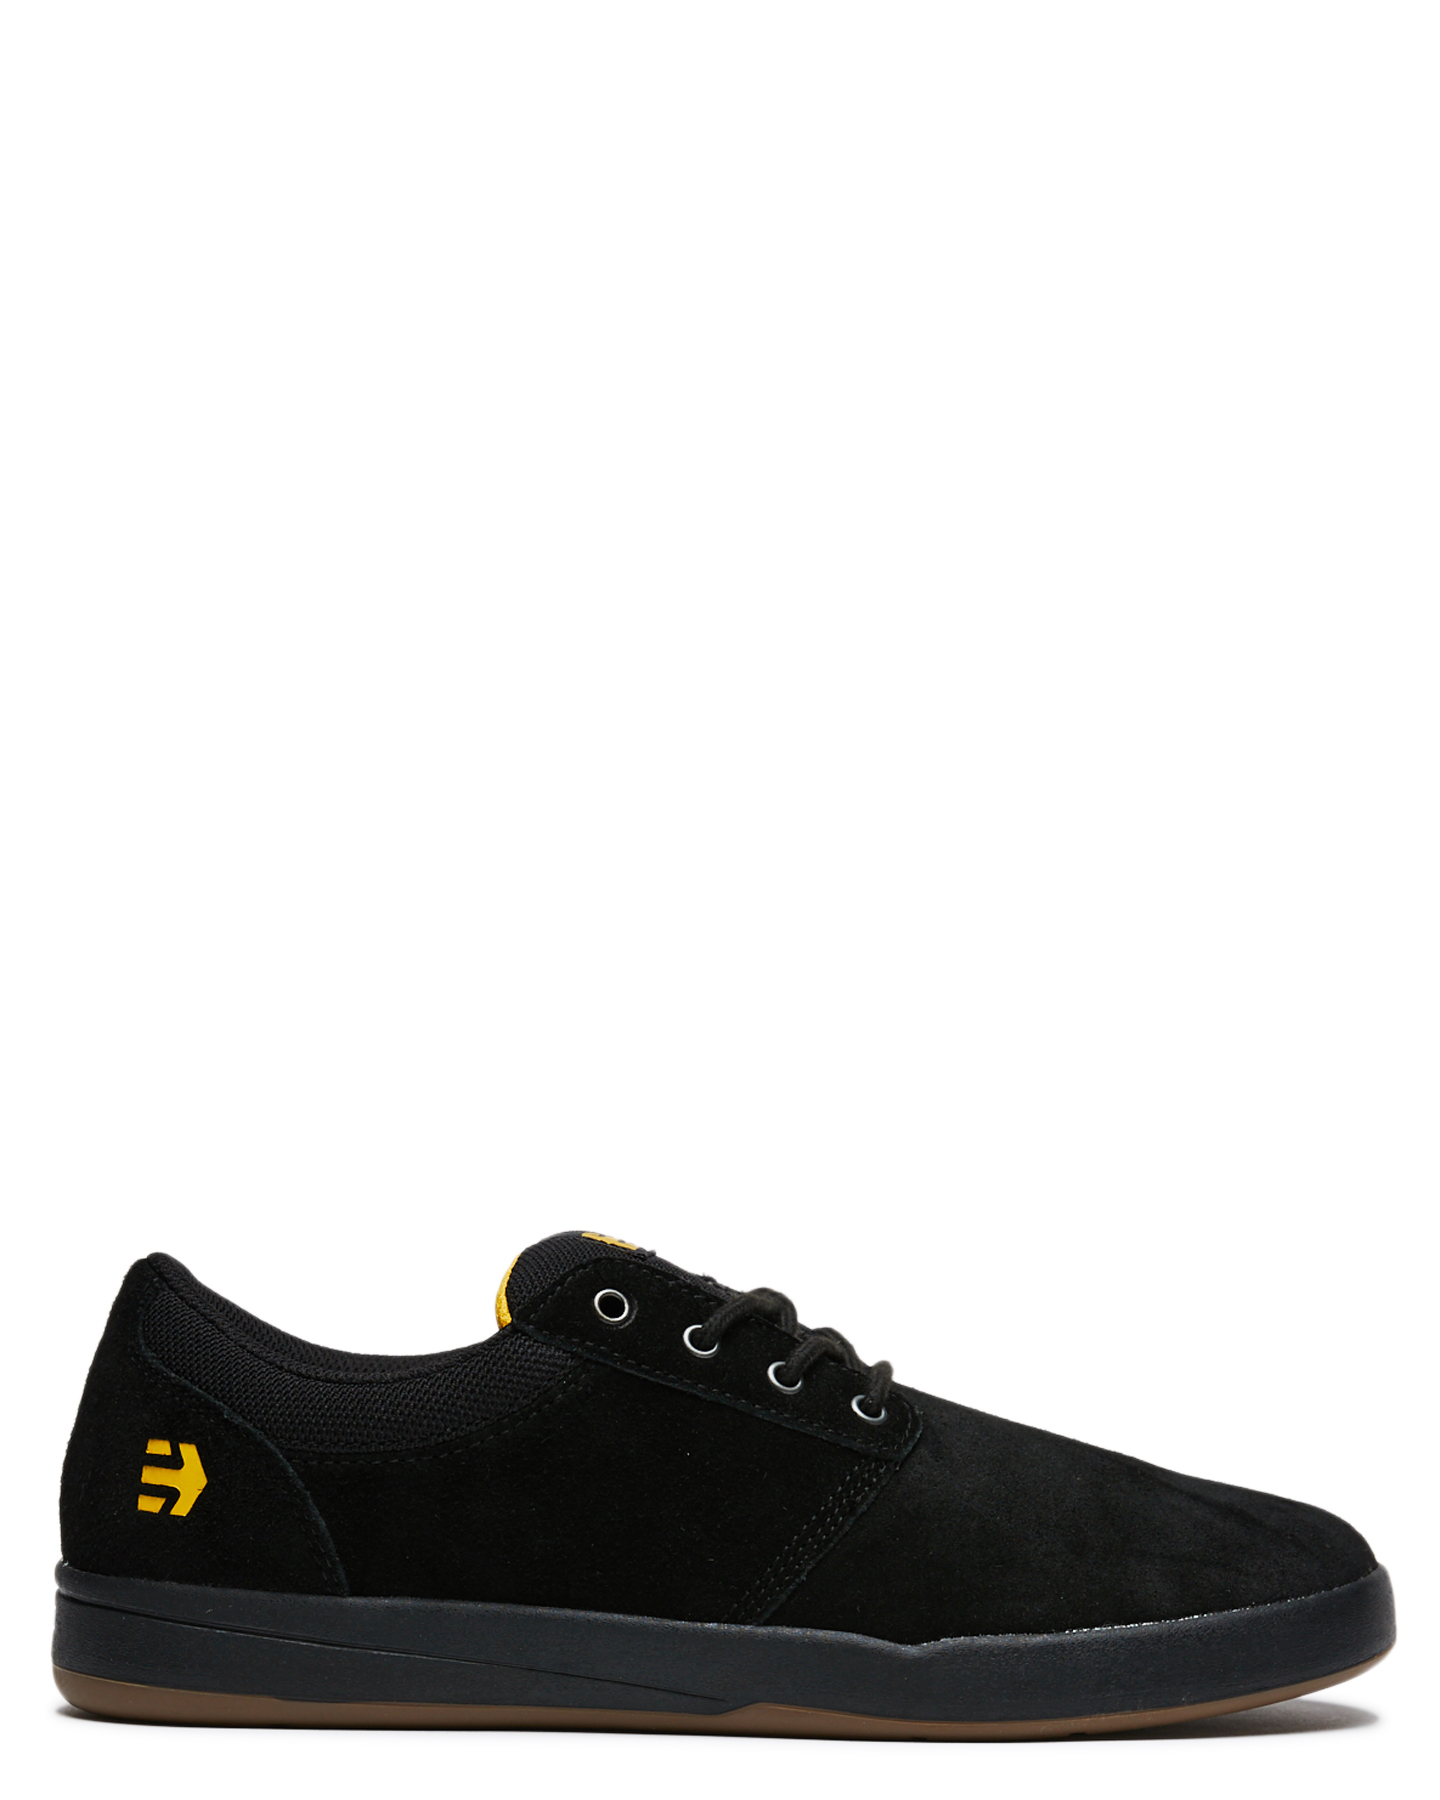 Etnies Mens Score Shoe Black Yellow